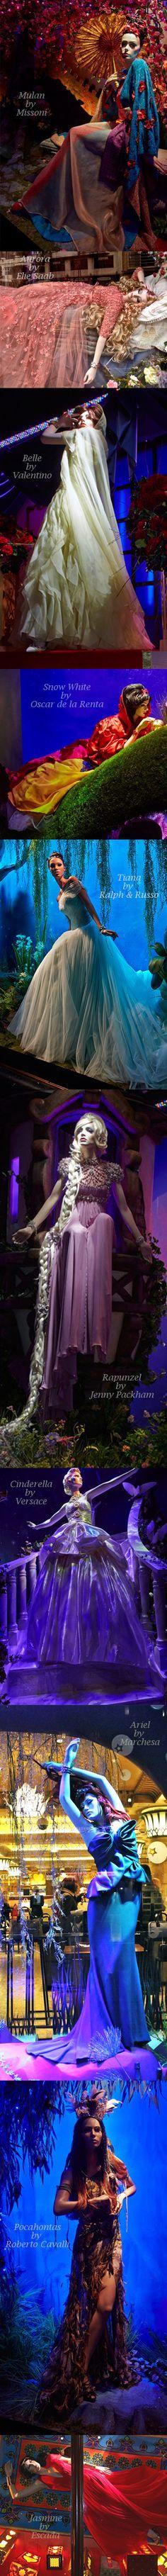 Harrods Designer Disney Princesses Window Displays